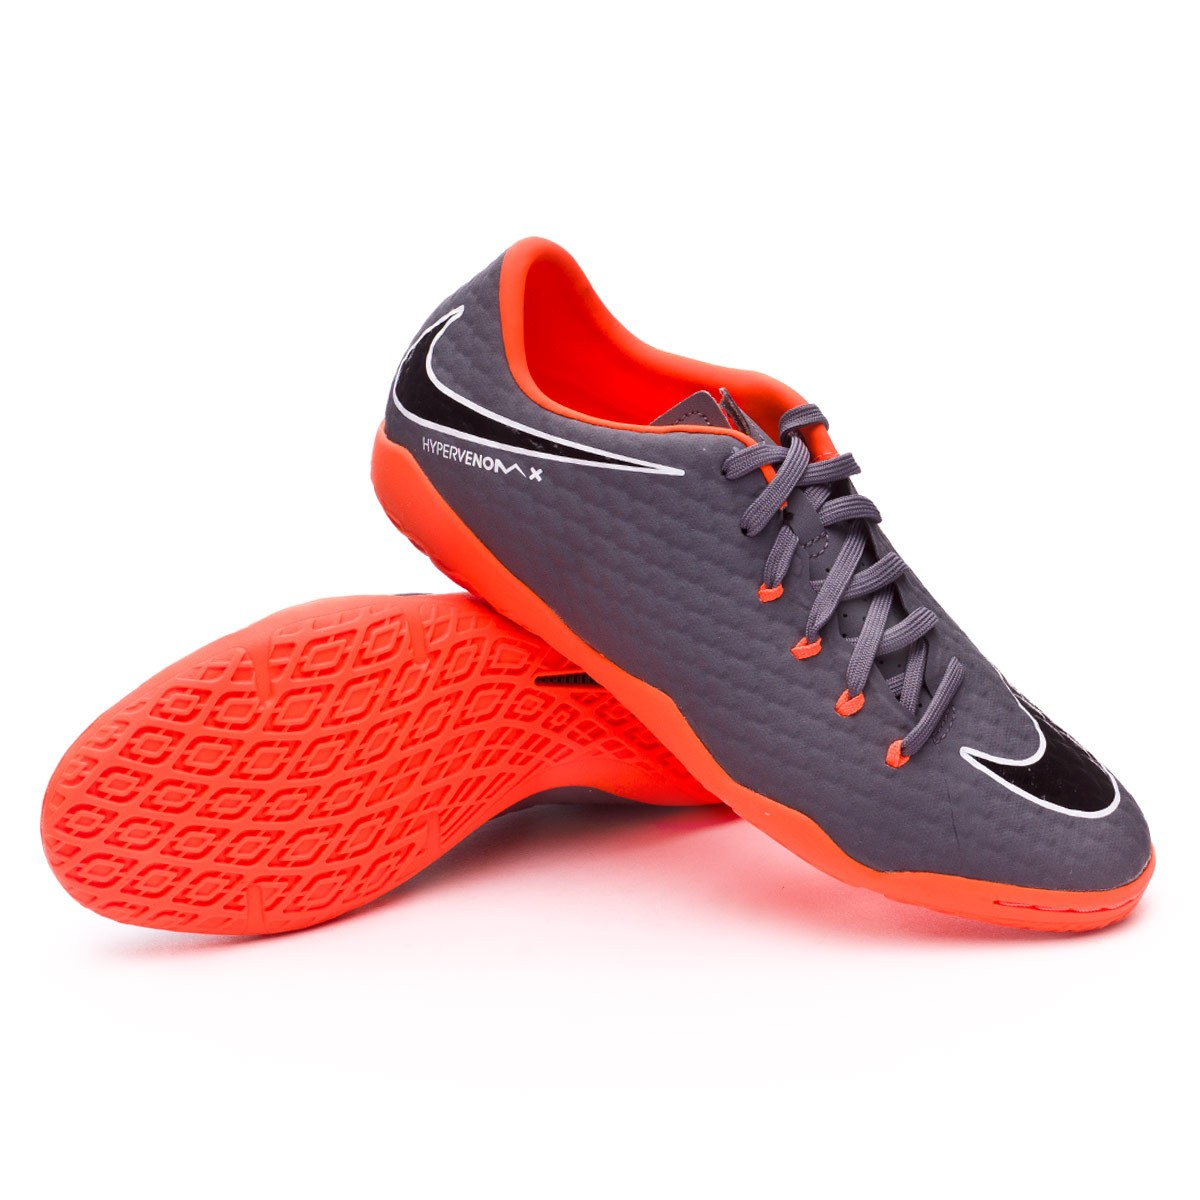 ebc005e3601fe ... get futsal boot nike hypervenom phantomx iii academy ic dark grey total  974e9 2ba09